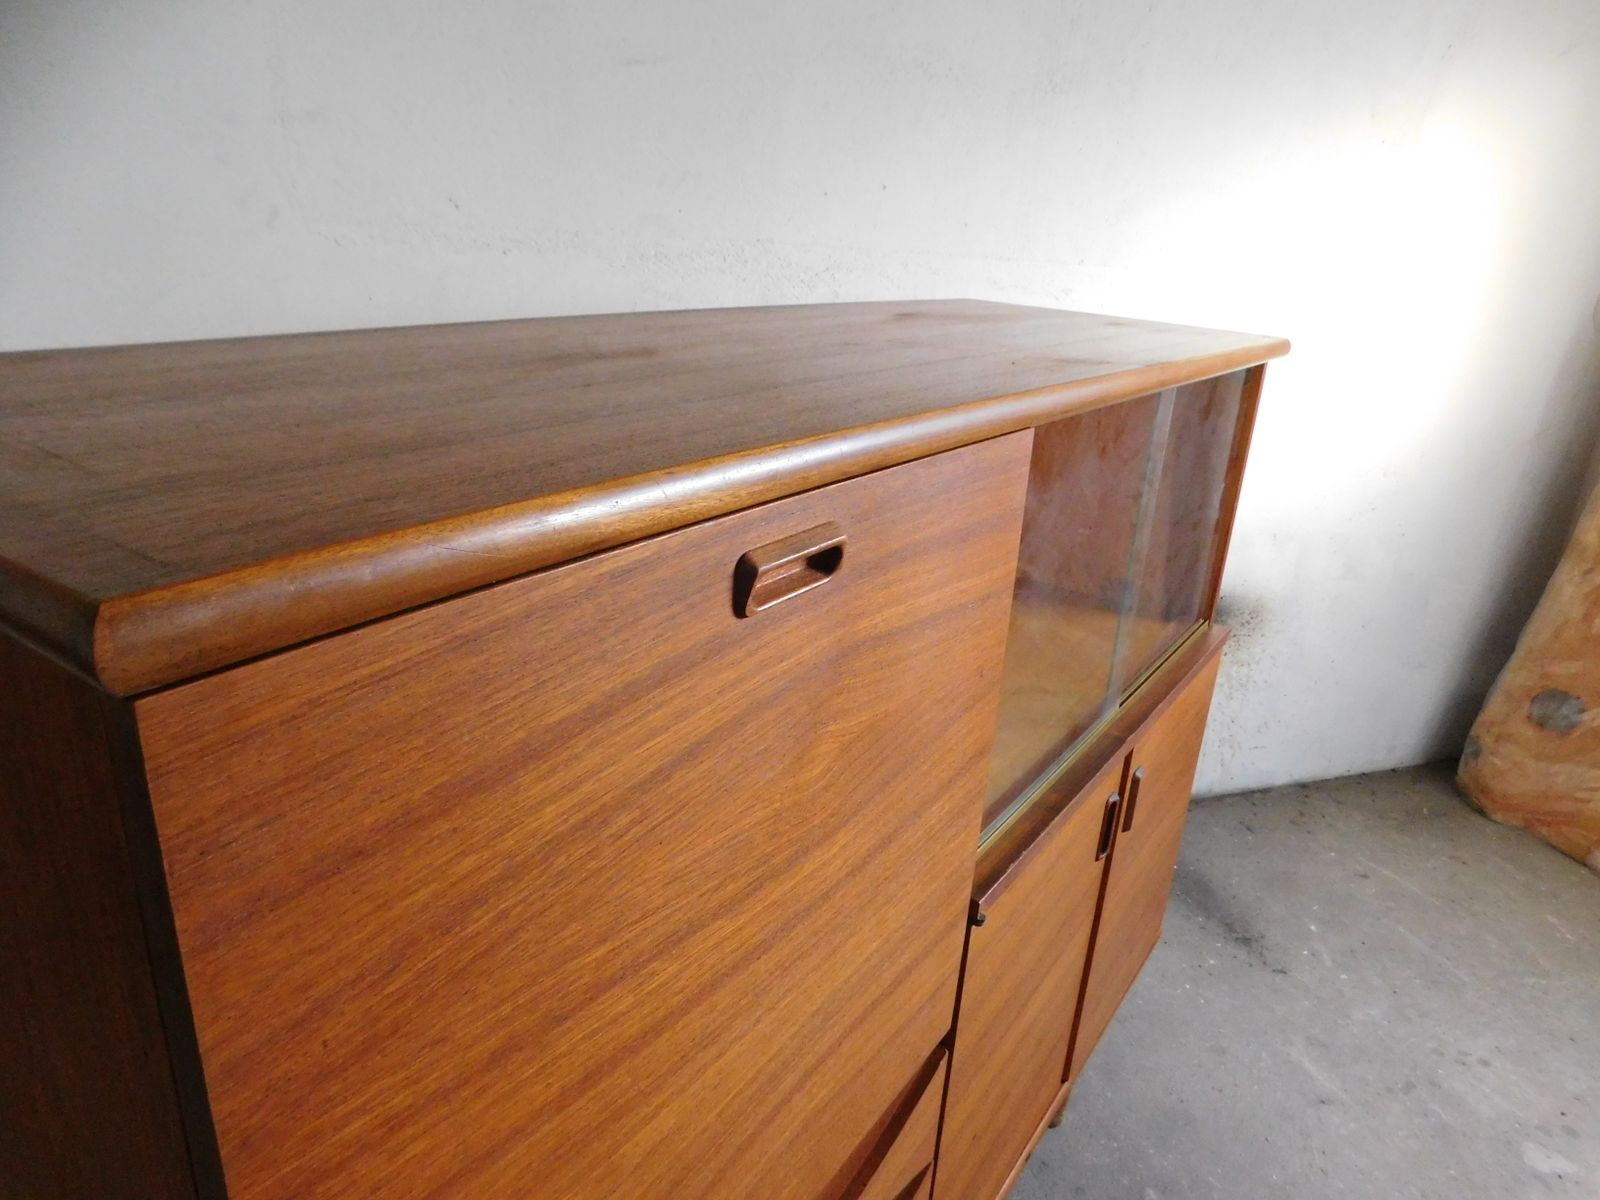 gro es teakholz sideboard mit schiebet ren aus glas. Black Bedroom Furniture Sets. Home Design Ideas